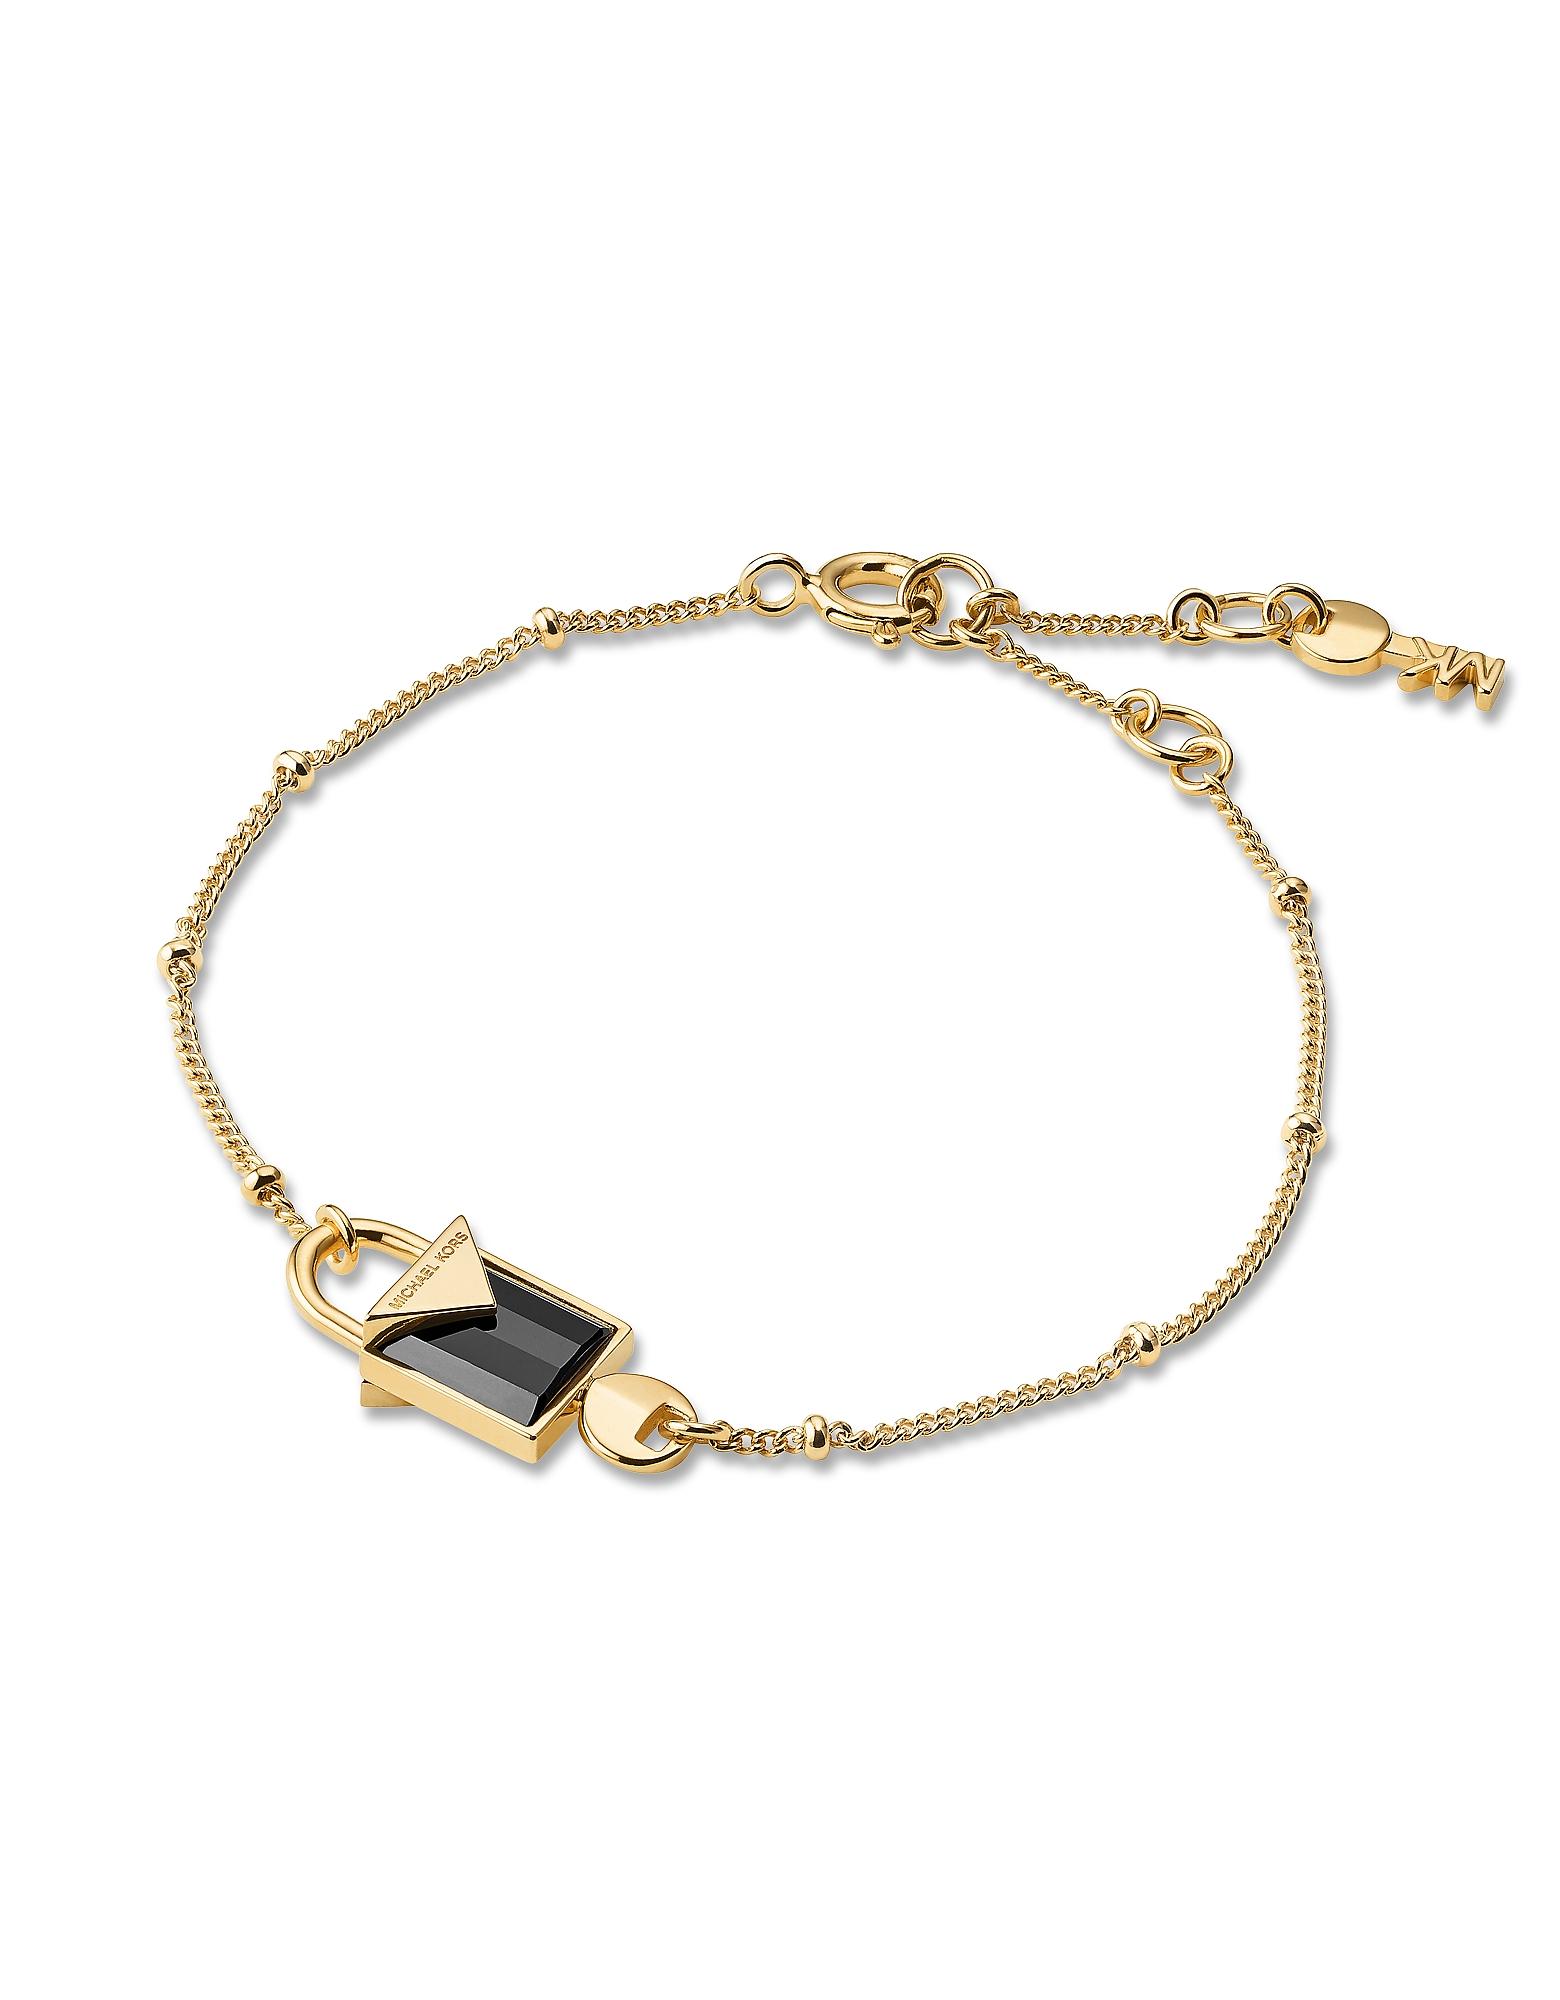 Mercer 14K Gold Plated Sterling Silver Lock Bracelet